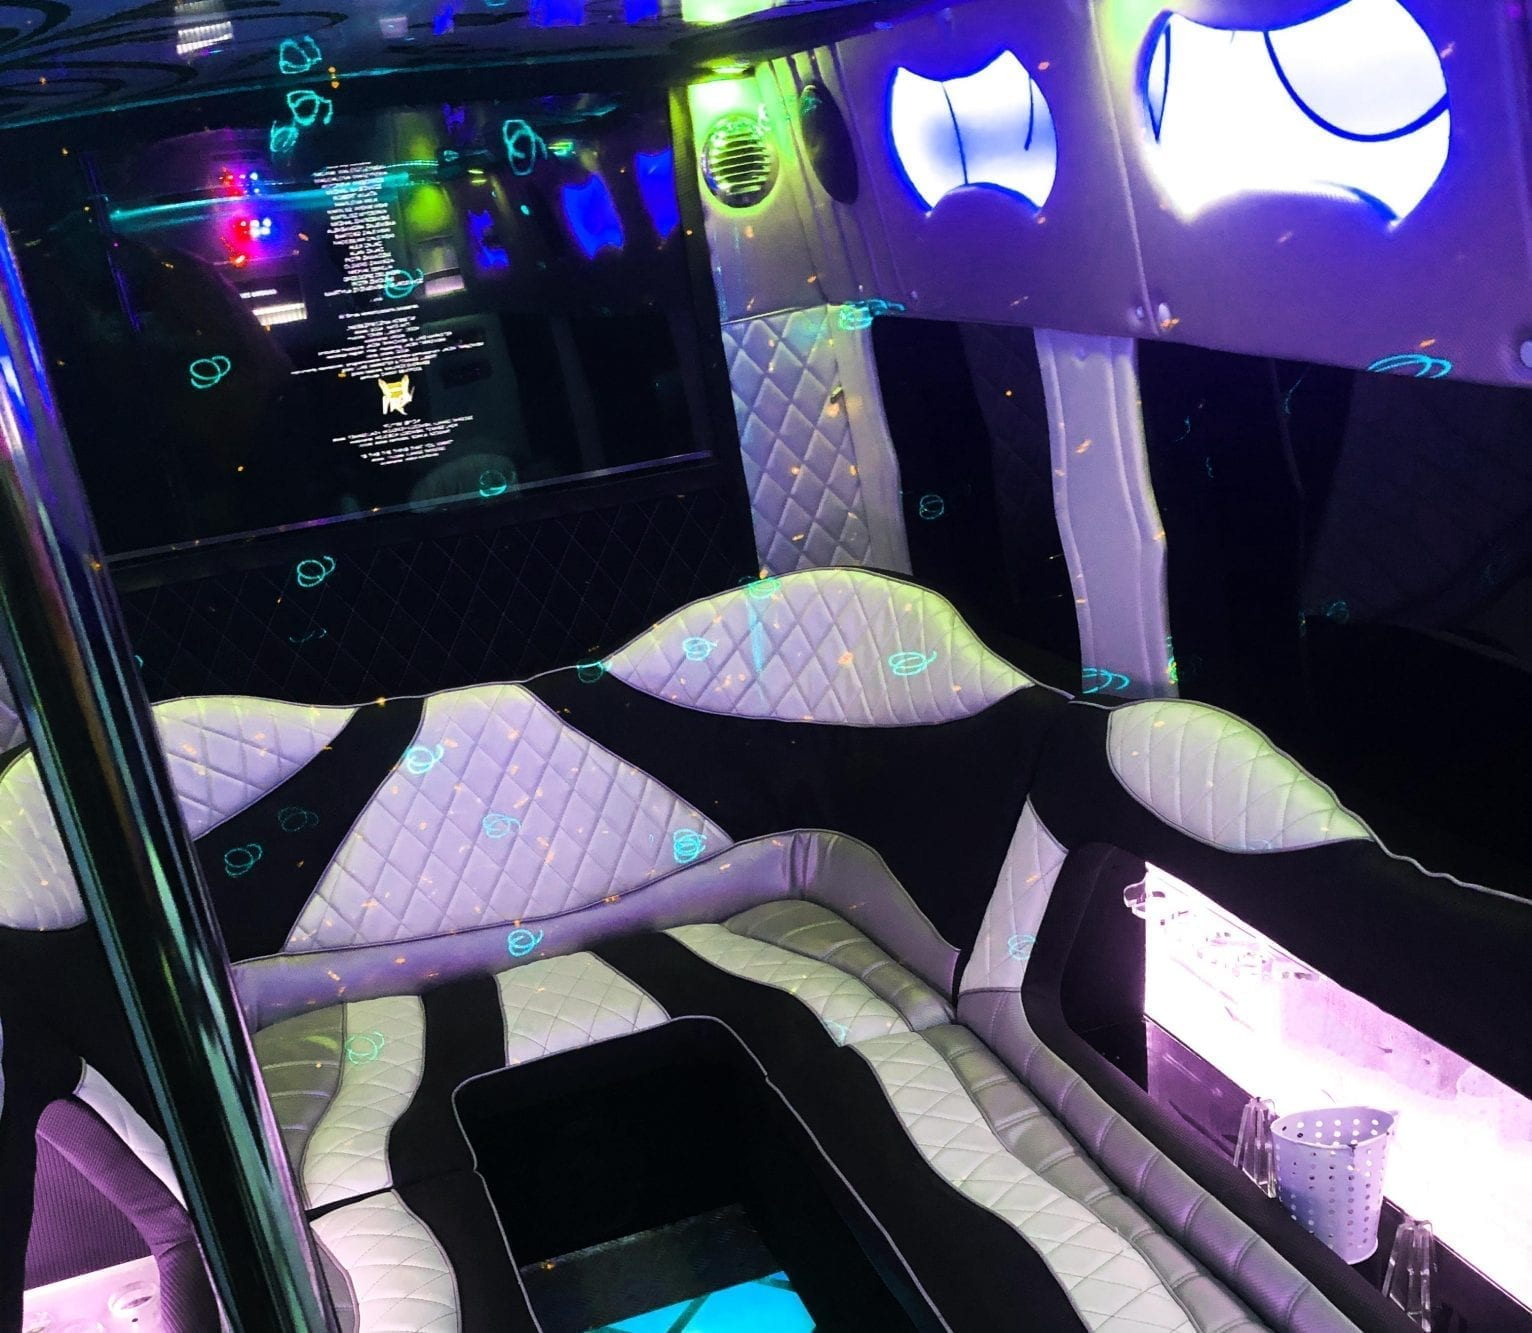 Party in a van in Wroclaw stripper bus